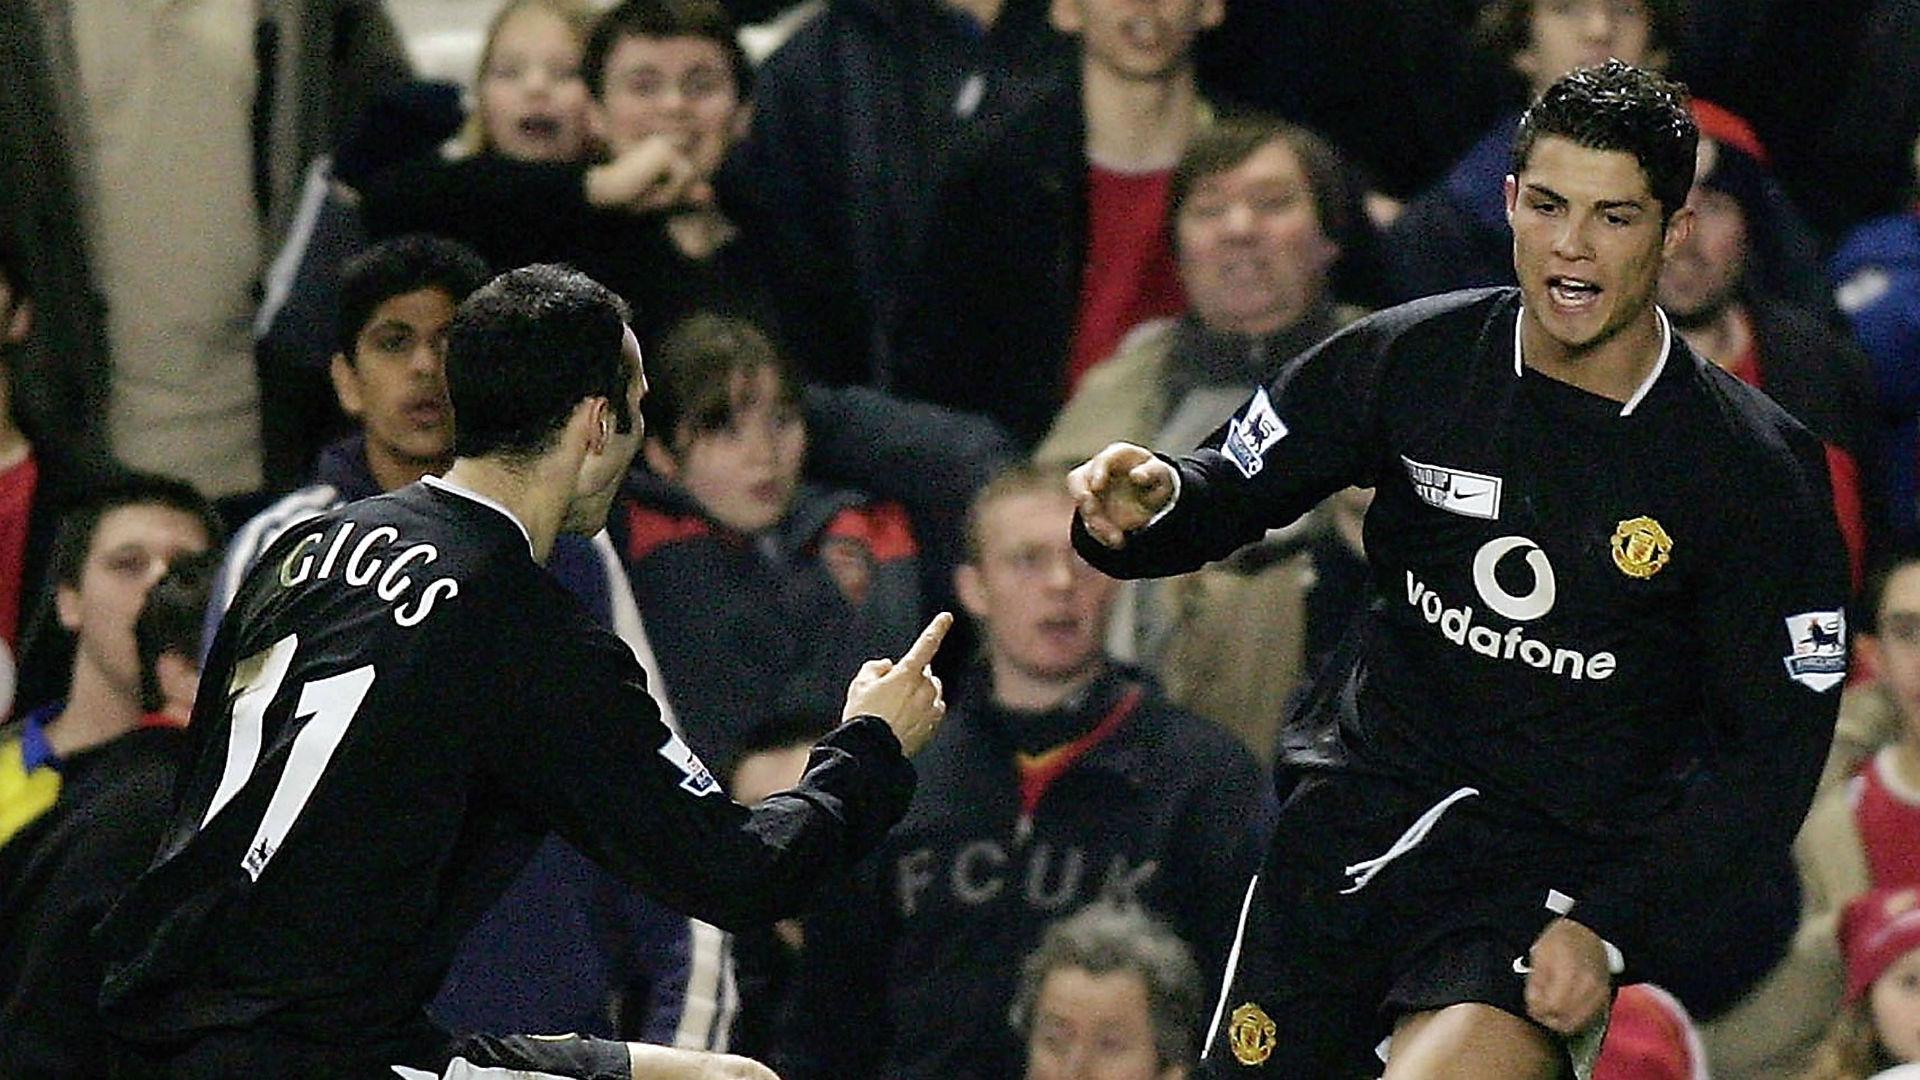 Ryan Giggs Cristiano Ronaldo Manchester United 2005